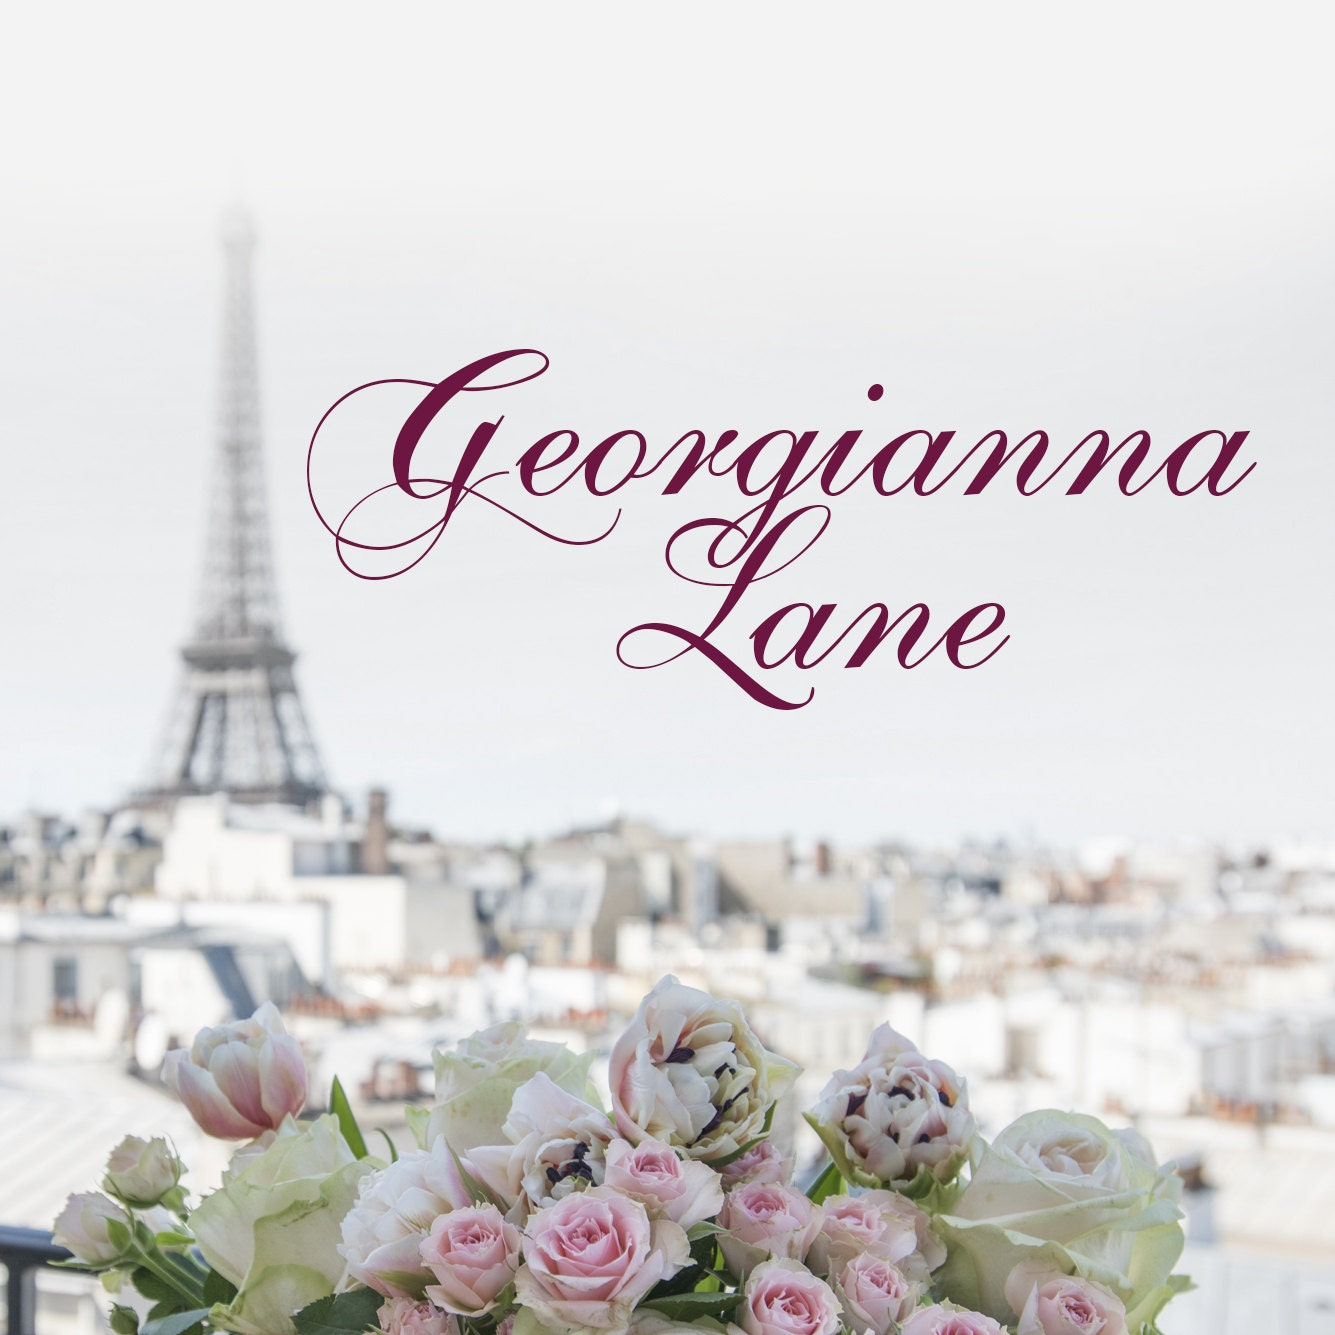 GeorgiannaLane